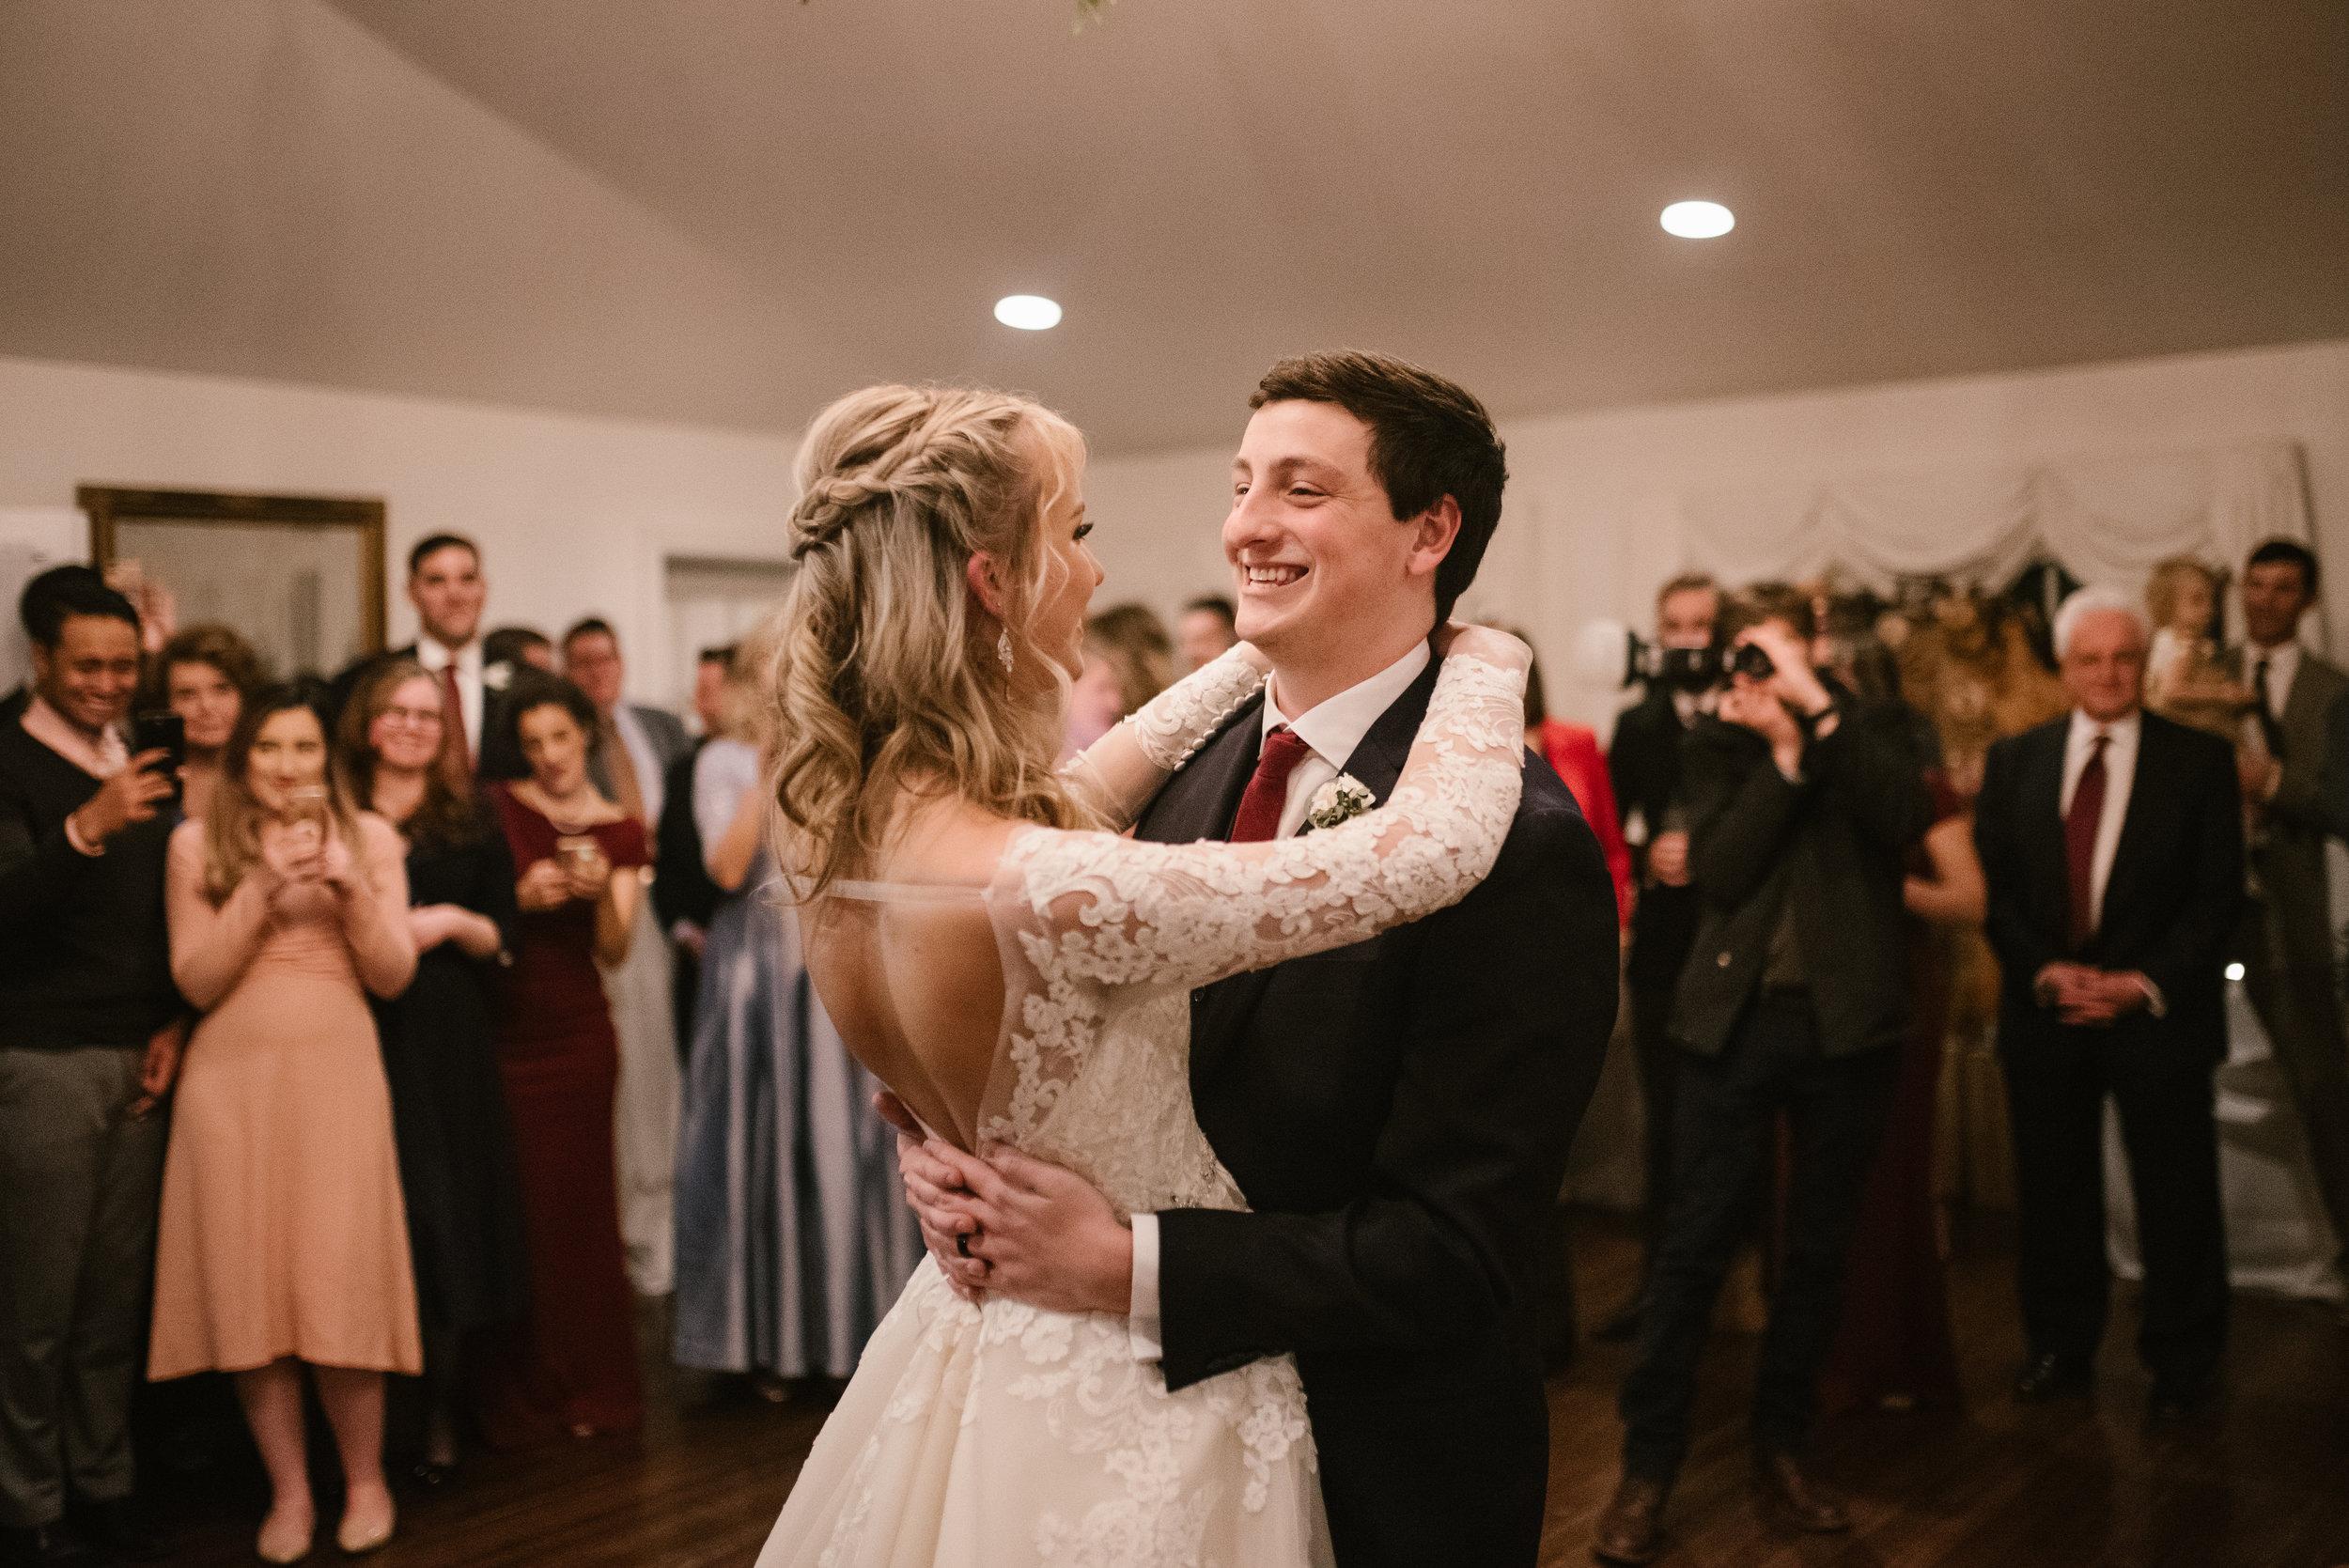 antrim-18444-spencer-wedding-1600.jpg